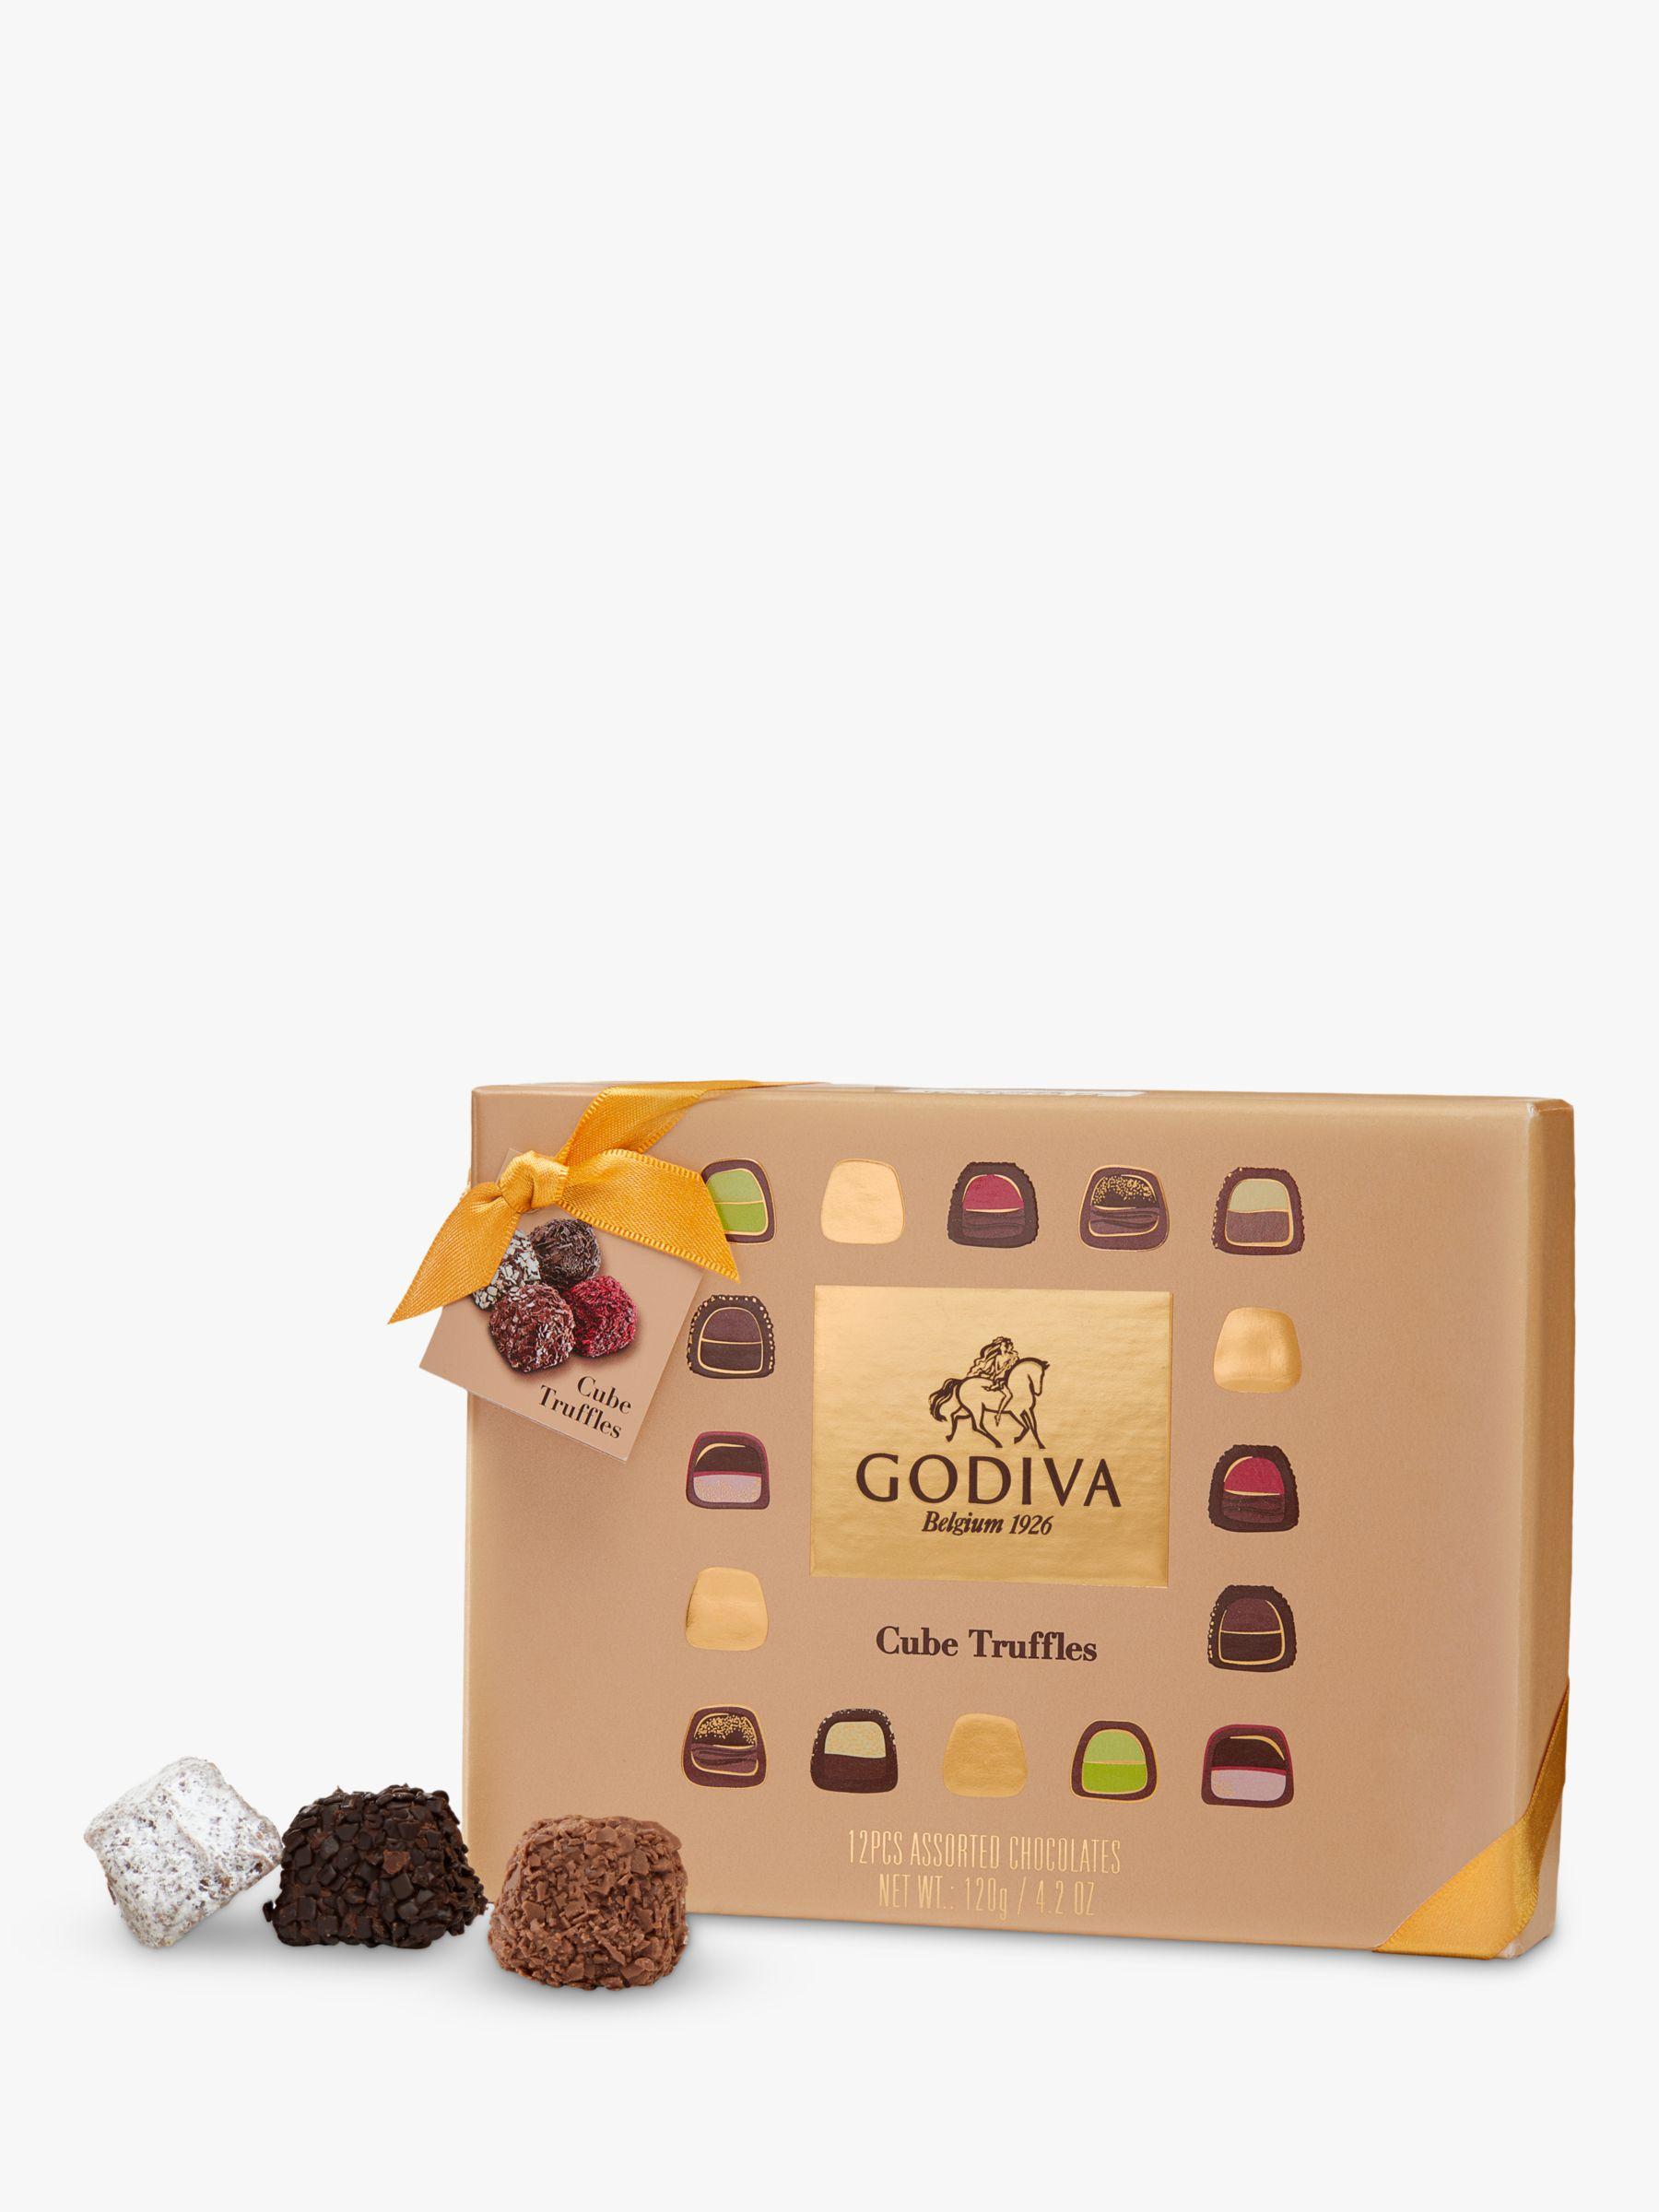 Godiva Godiva Cube Truffles, 12 Pieces, 120g